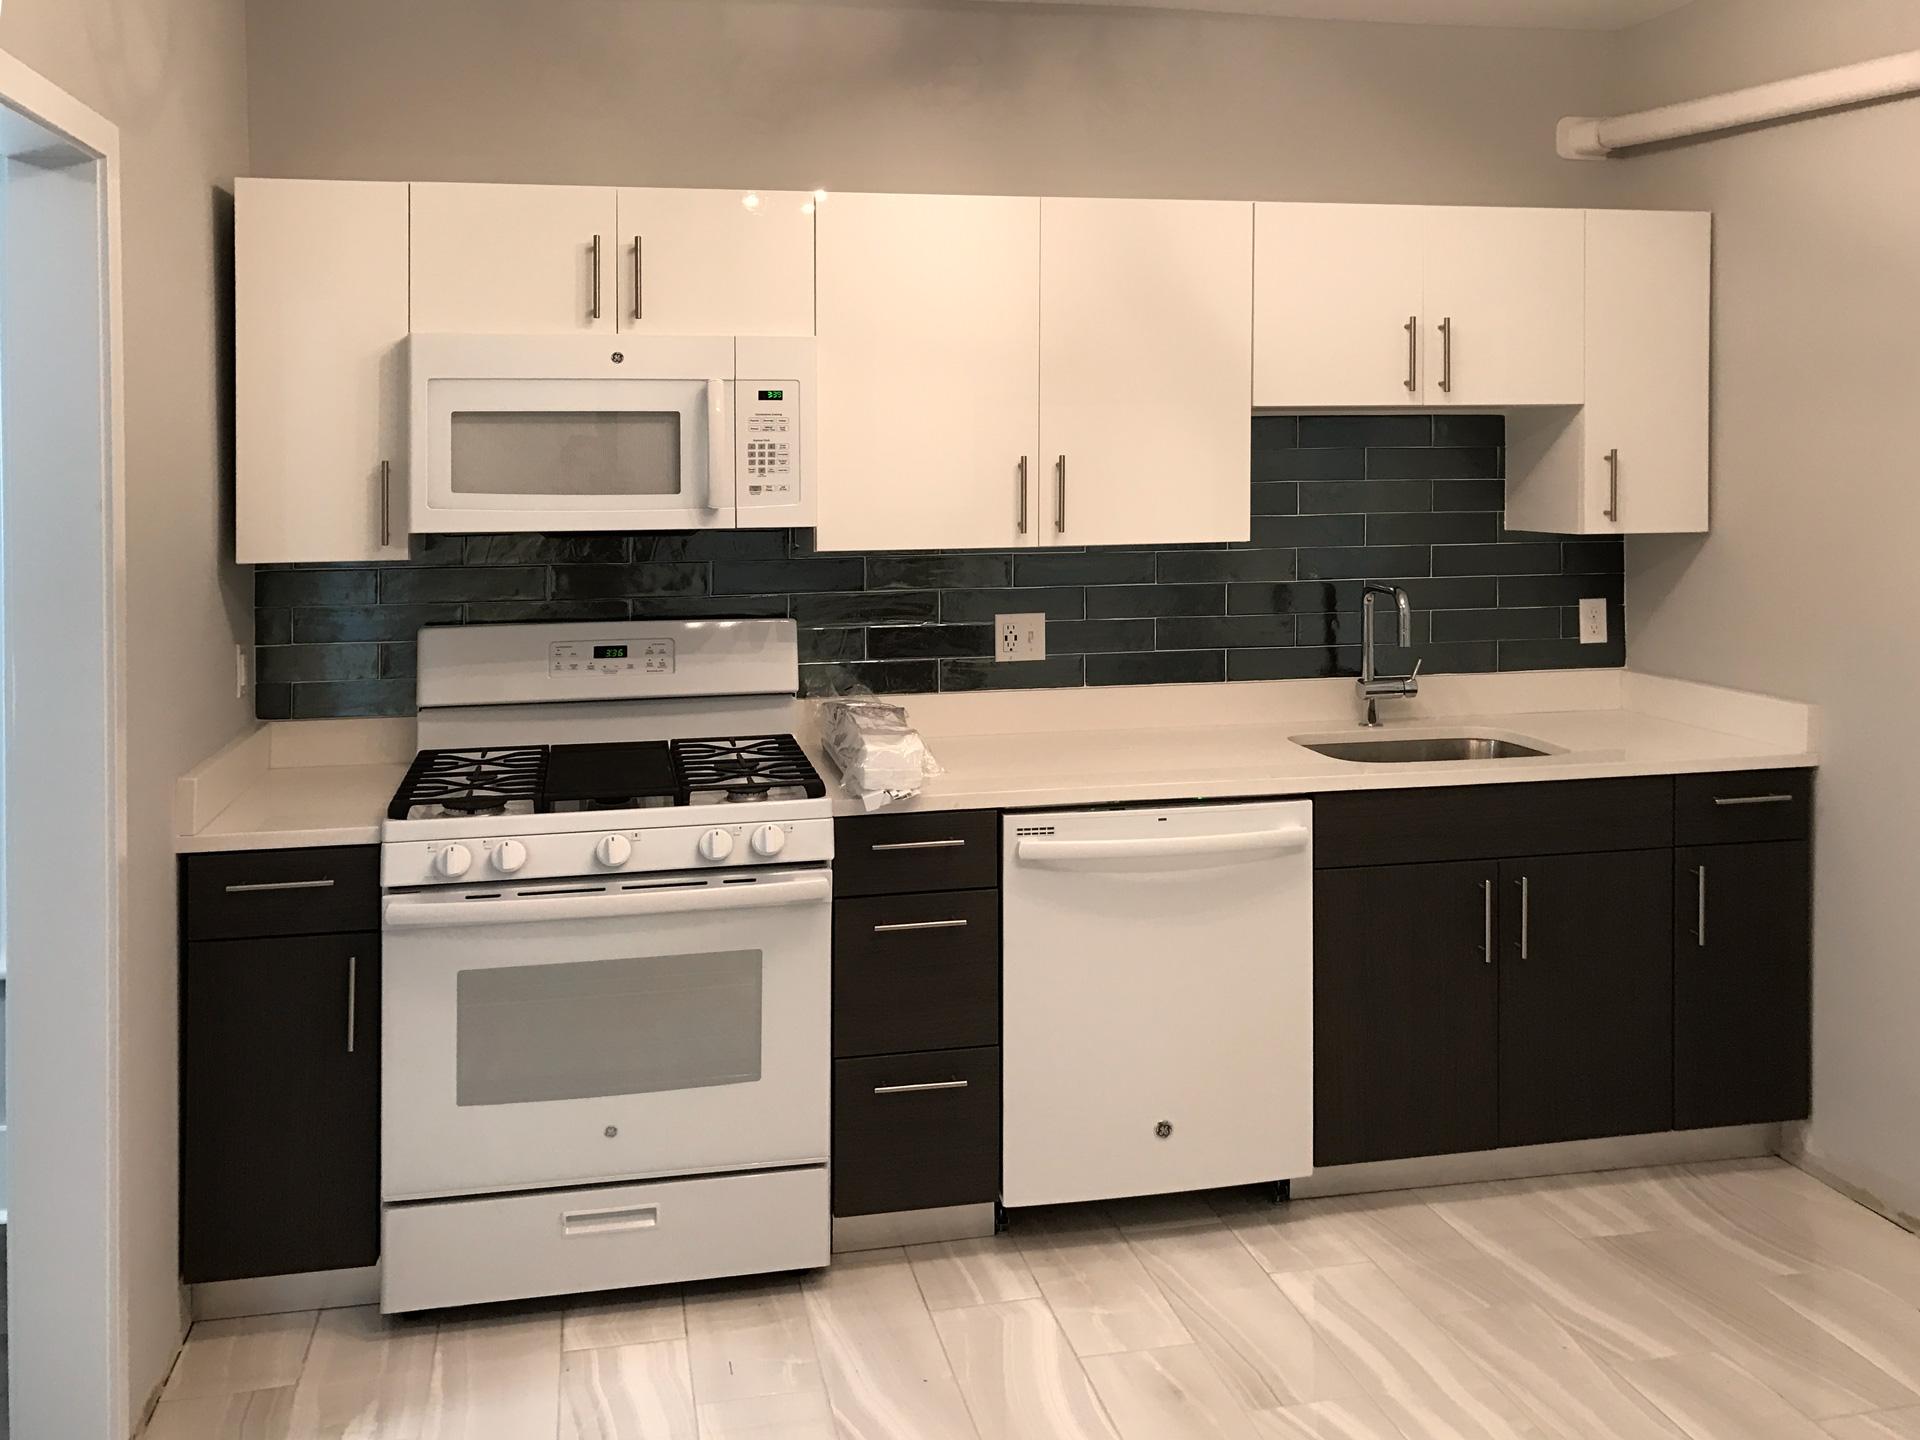 Kitchen - New Construction